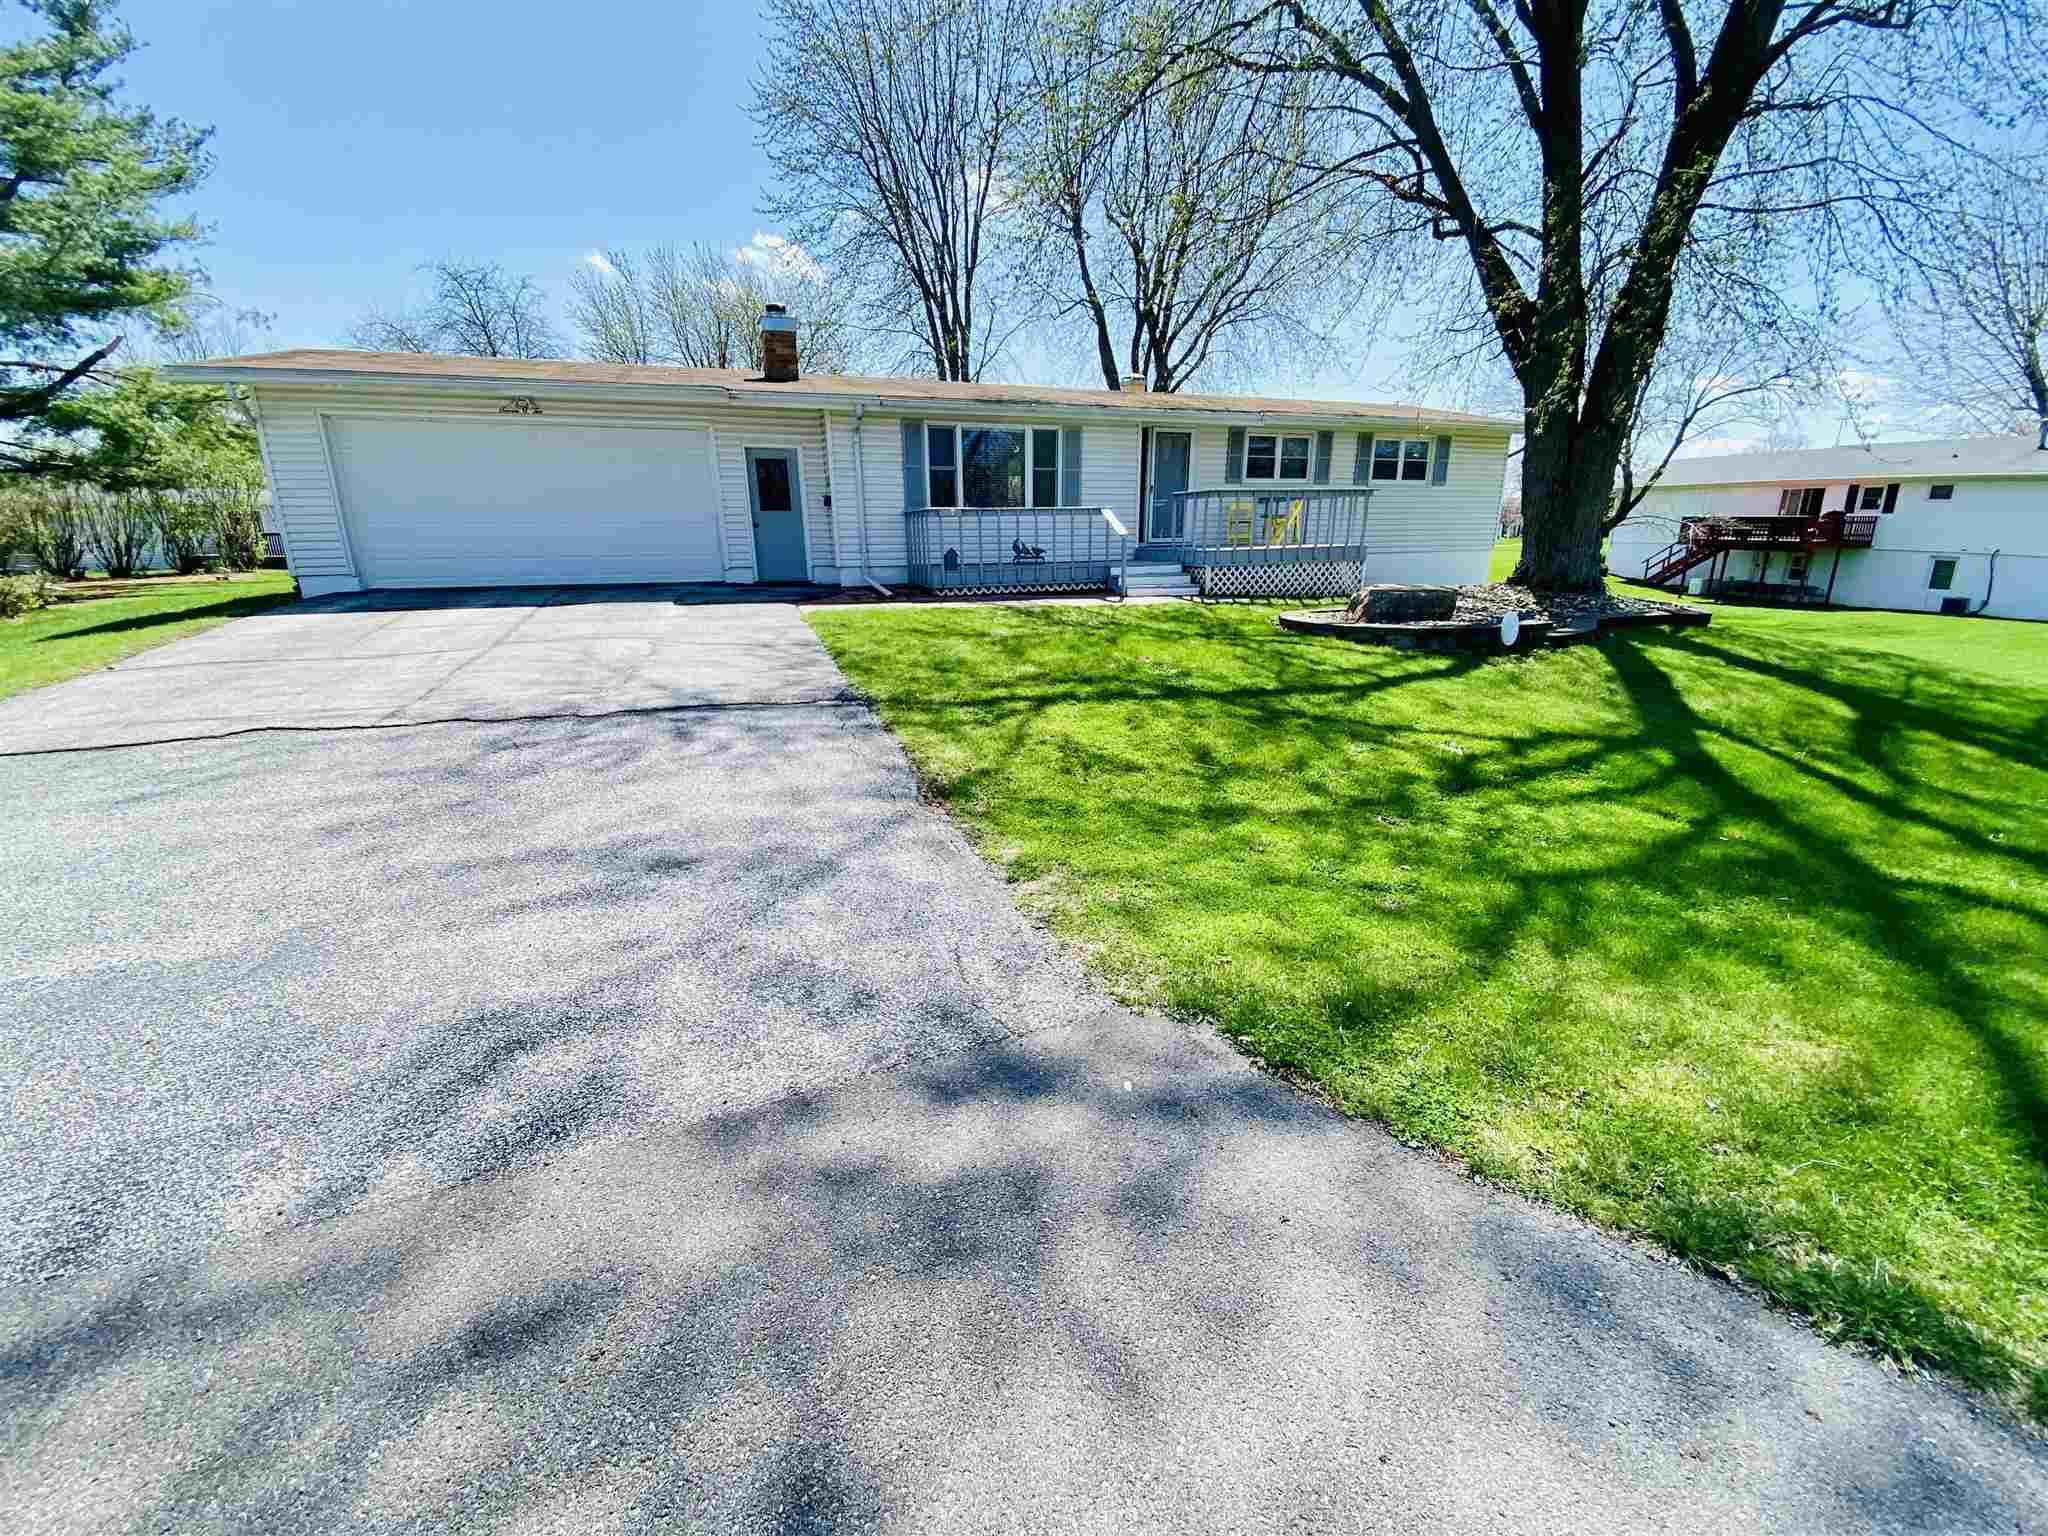 702 SW 9TH Property Photo - Aledo, IL real estate listing